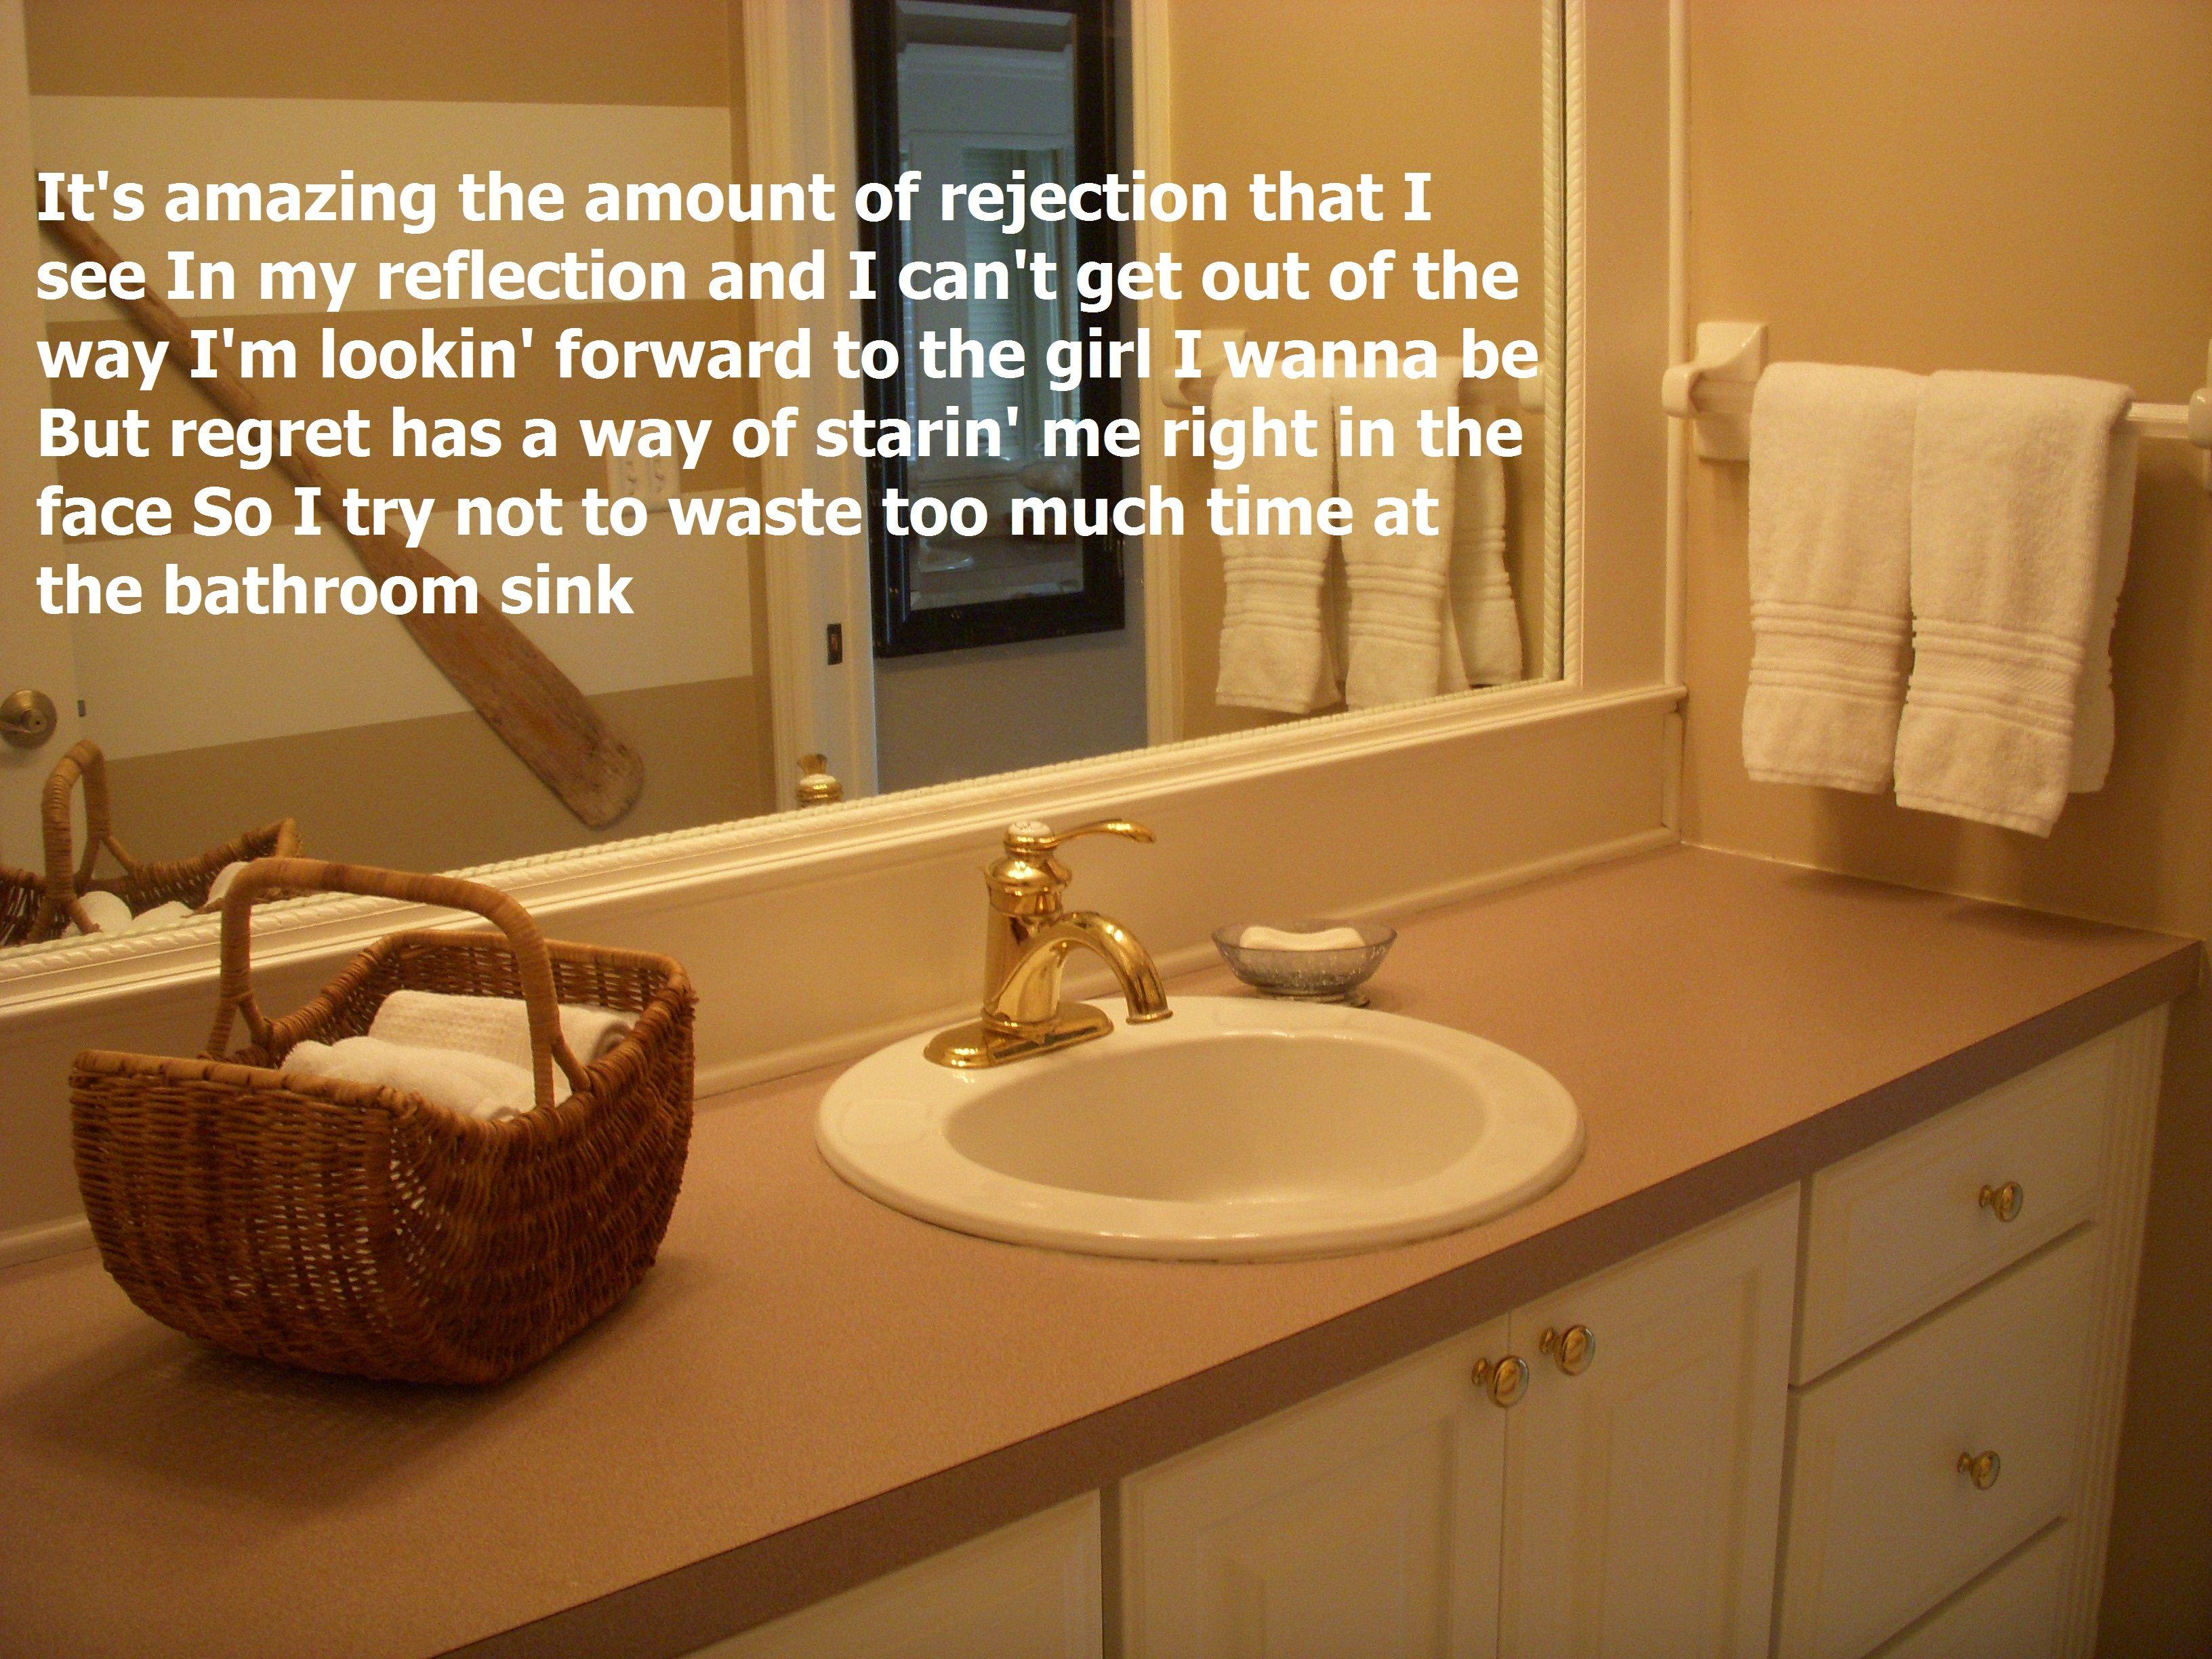 Amazing Bathroom Sink Miranda Lambert. I Made My Own Pin Of These Lyrics Mos Ago